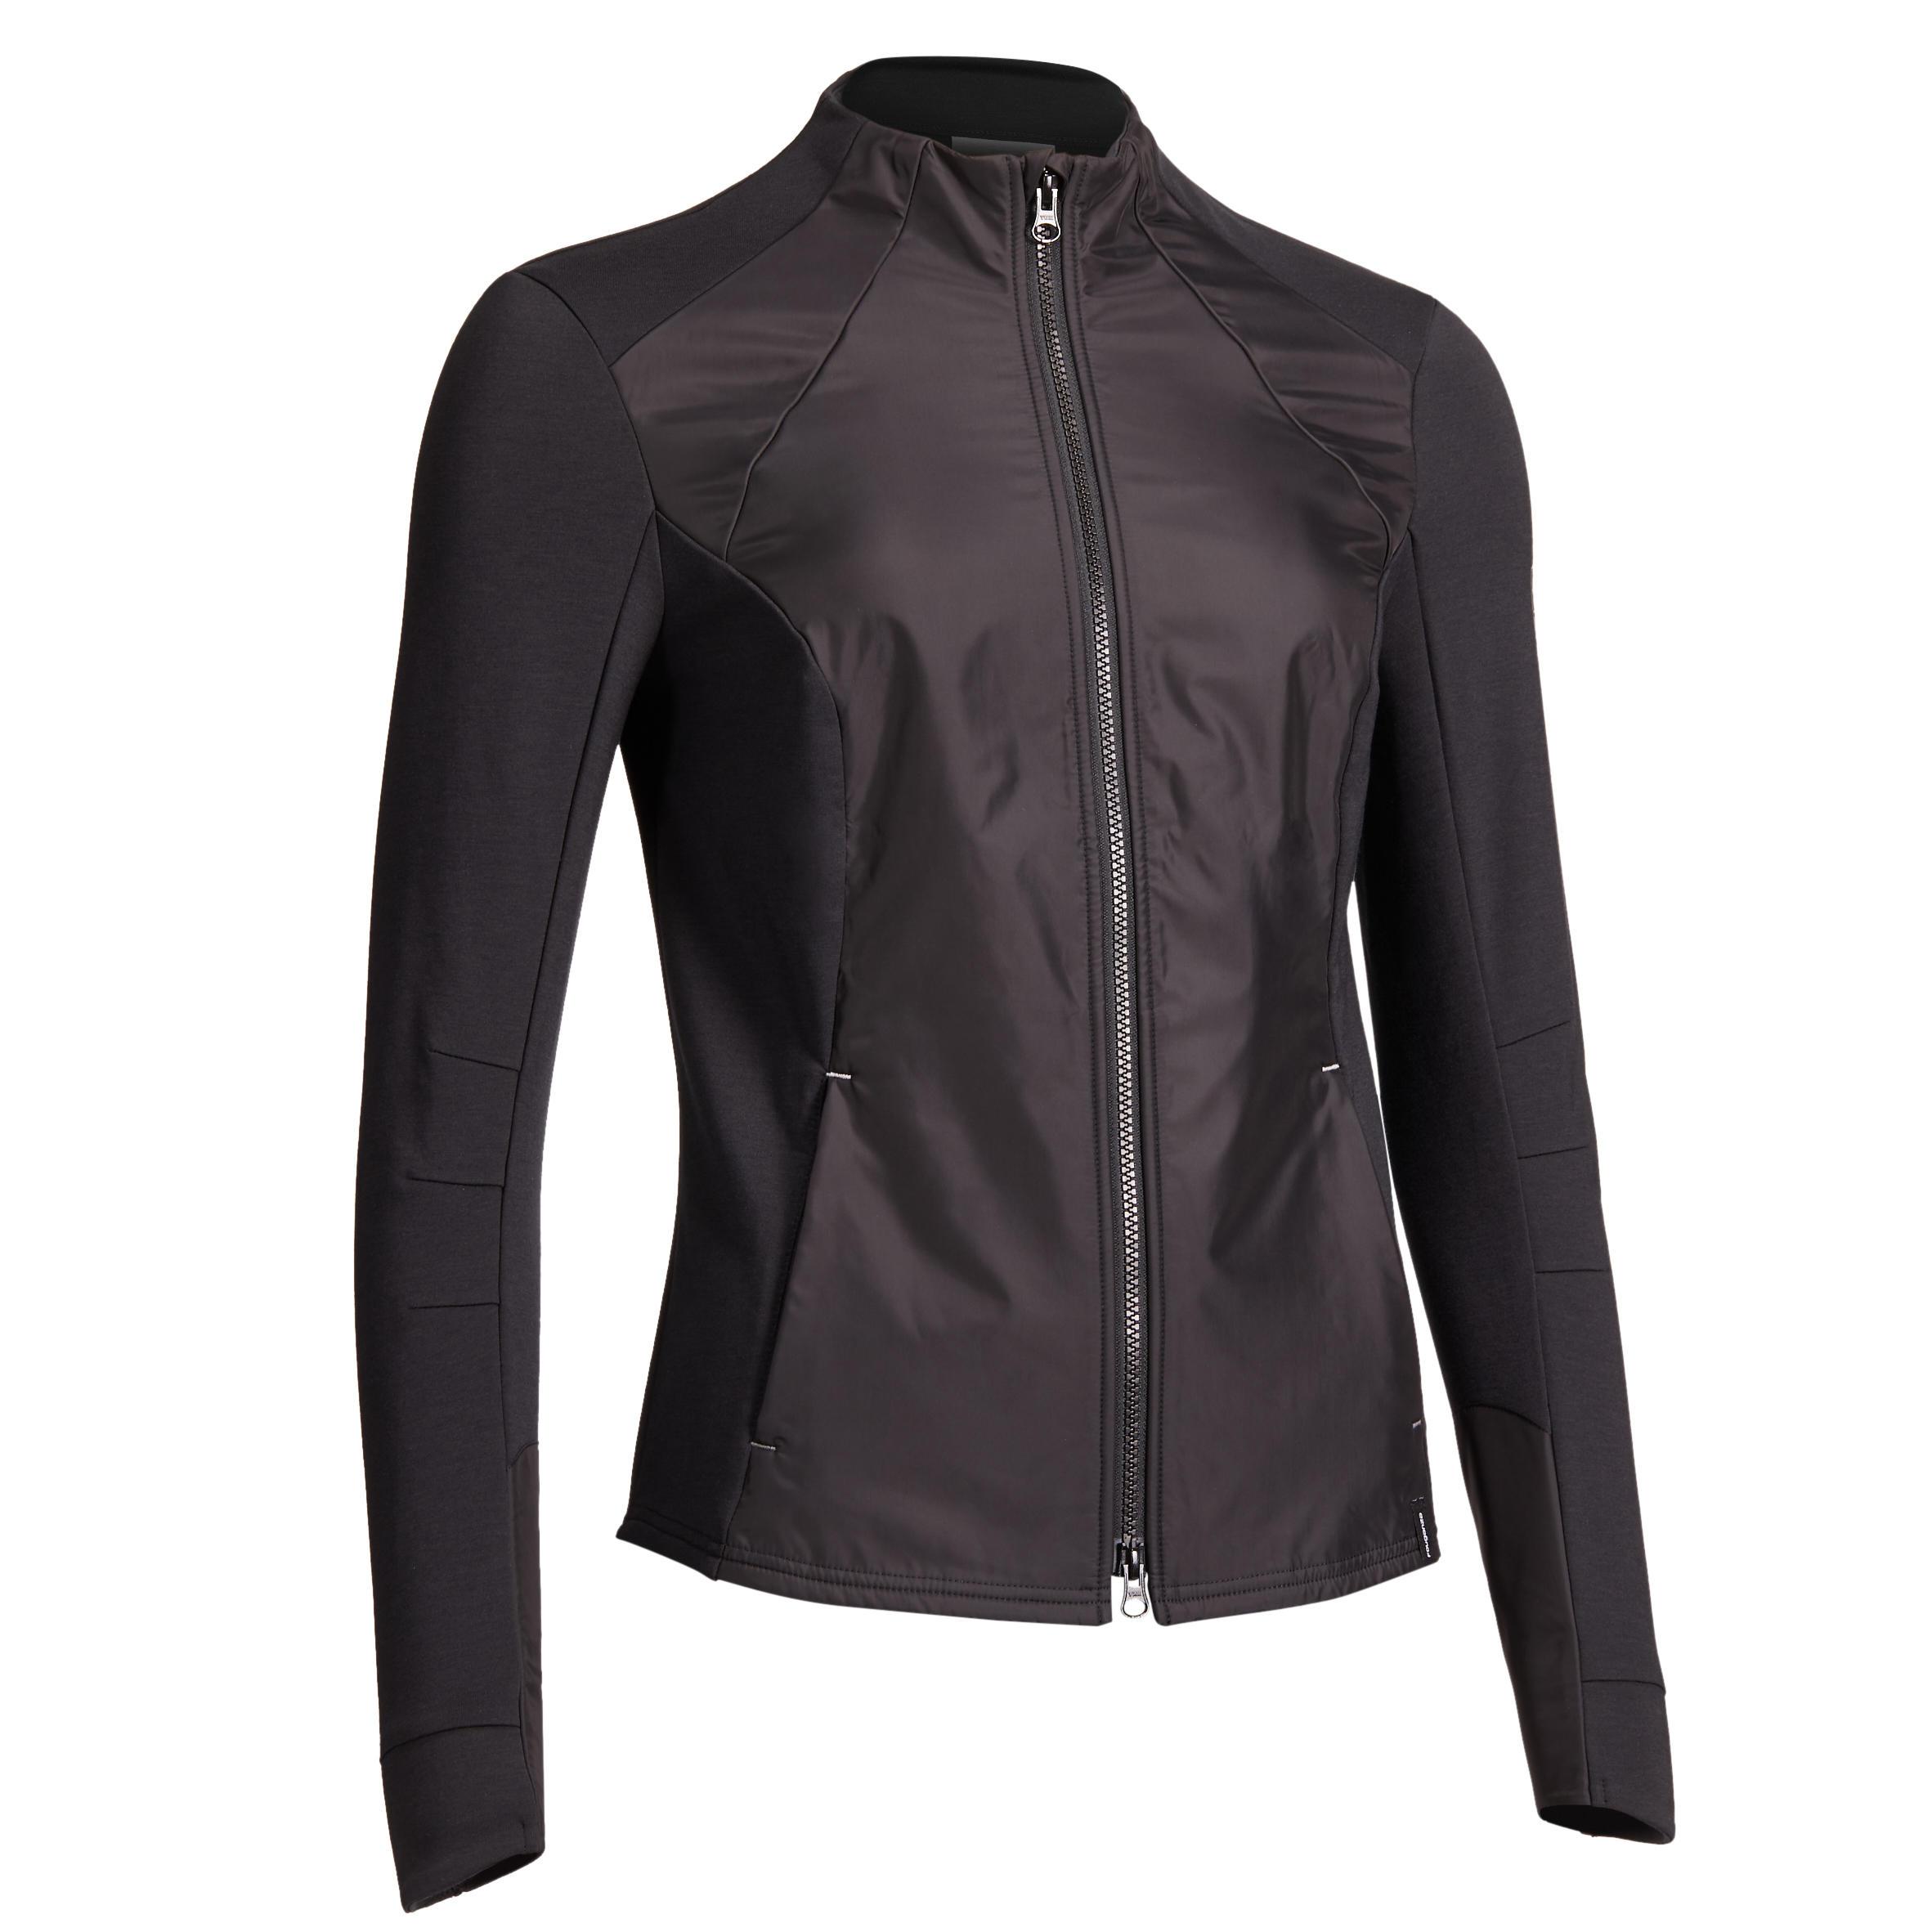 Sweatjacke 500 Damen | Bekleidung > Sweatshirts & -jacken > Sweatjacken | Fouganza